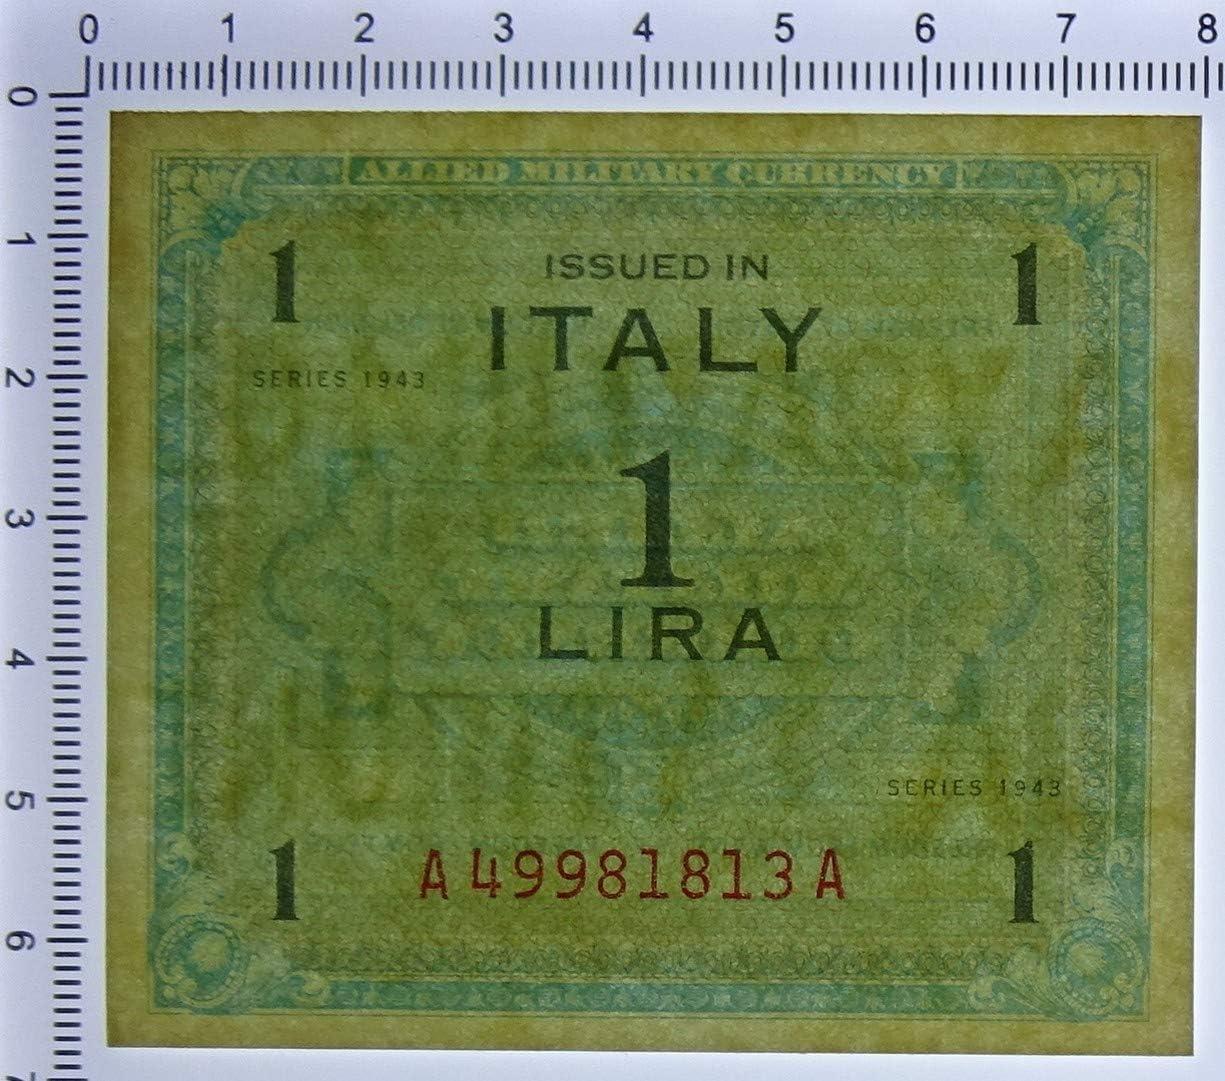 Cartamoneta.com 1 Lira Occupazione Americana in Italia MONOLINGUA FLC 1943 FDS